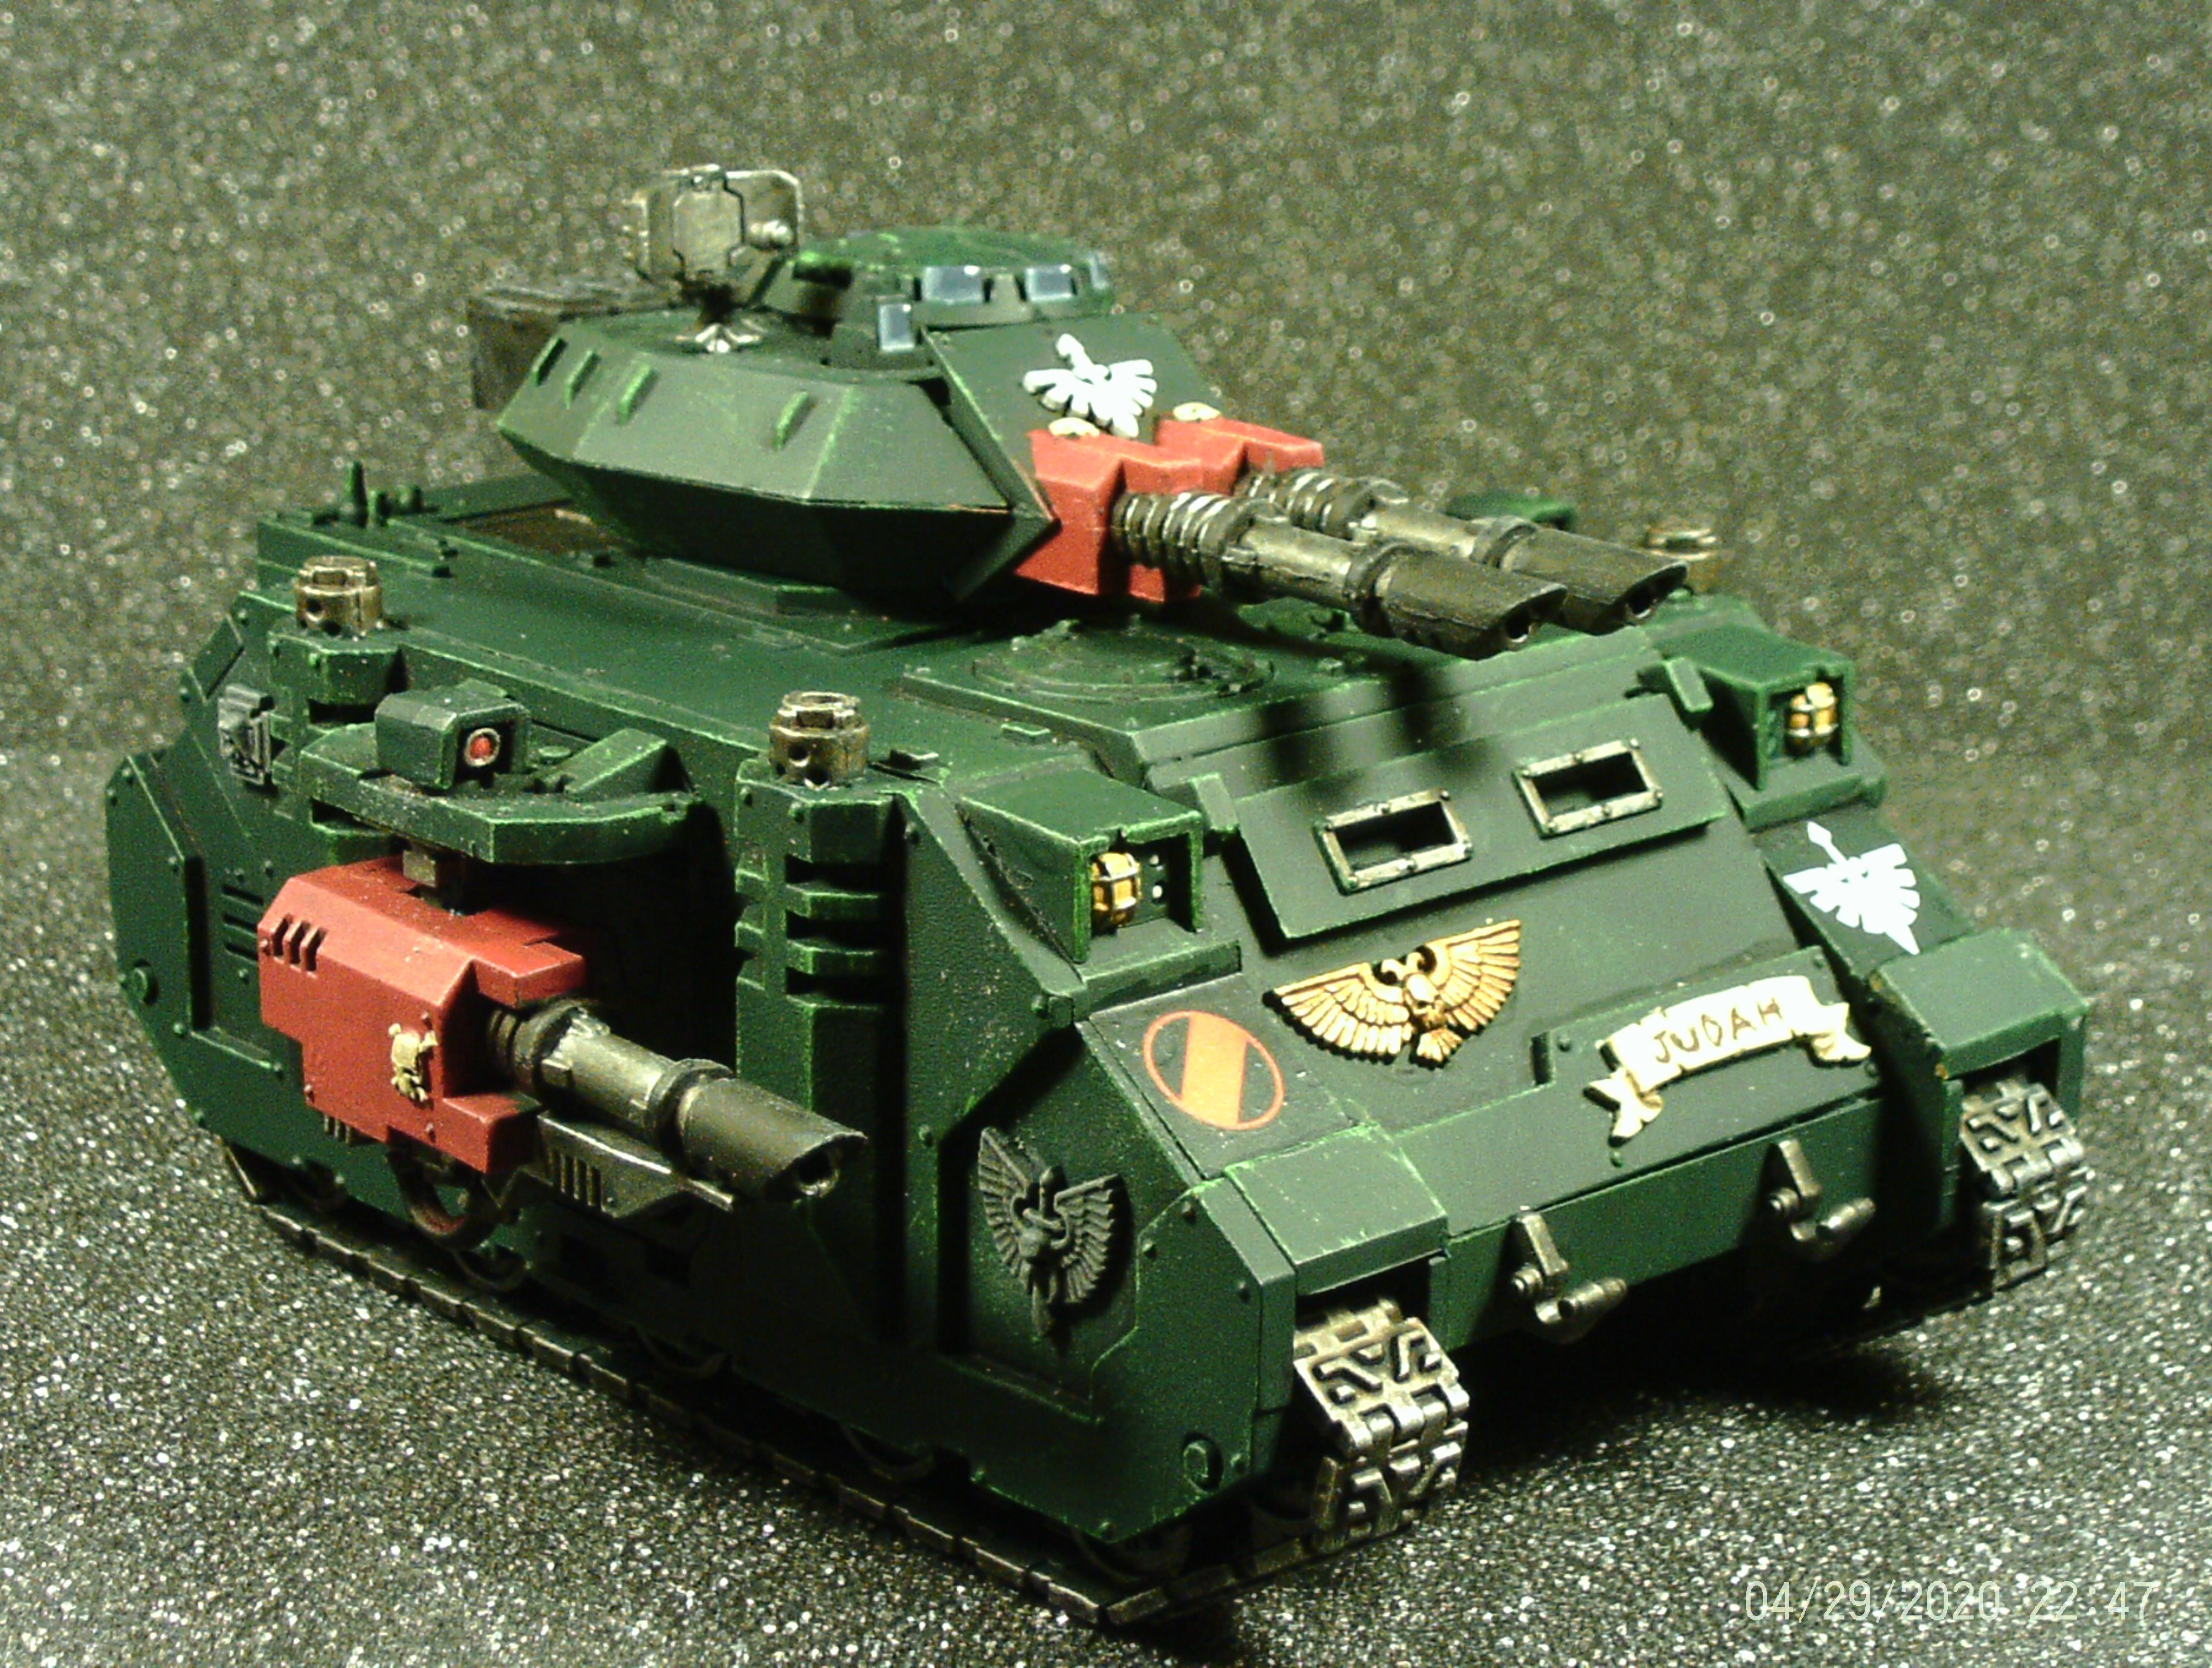 Angel, Annihilator, Dark, Lascannon, Laser, Predator, Rhino, Space, Space Marines, Tank, Vehicle